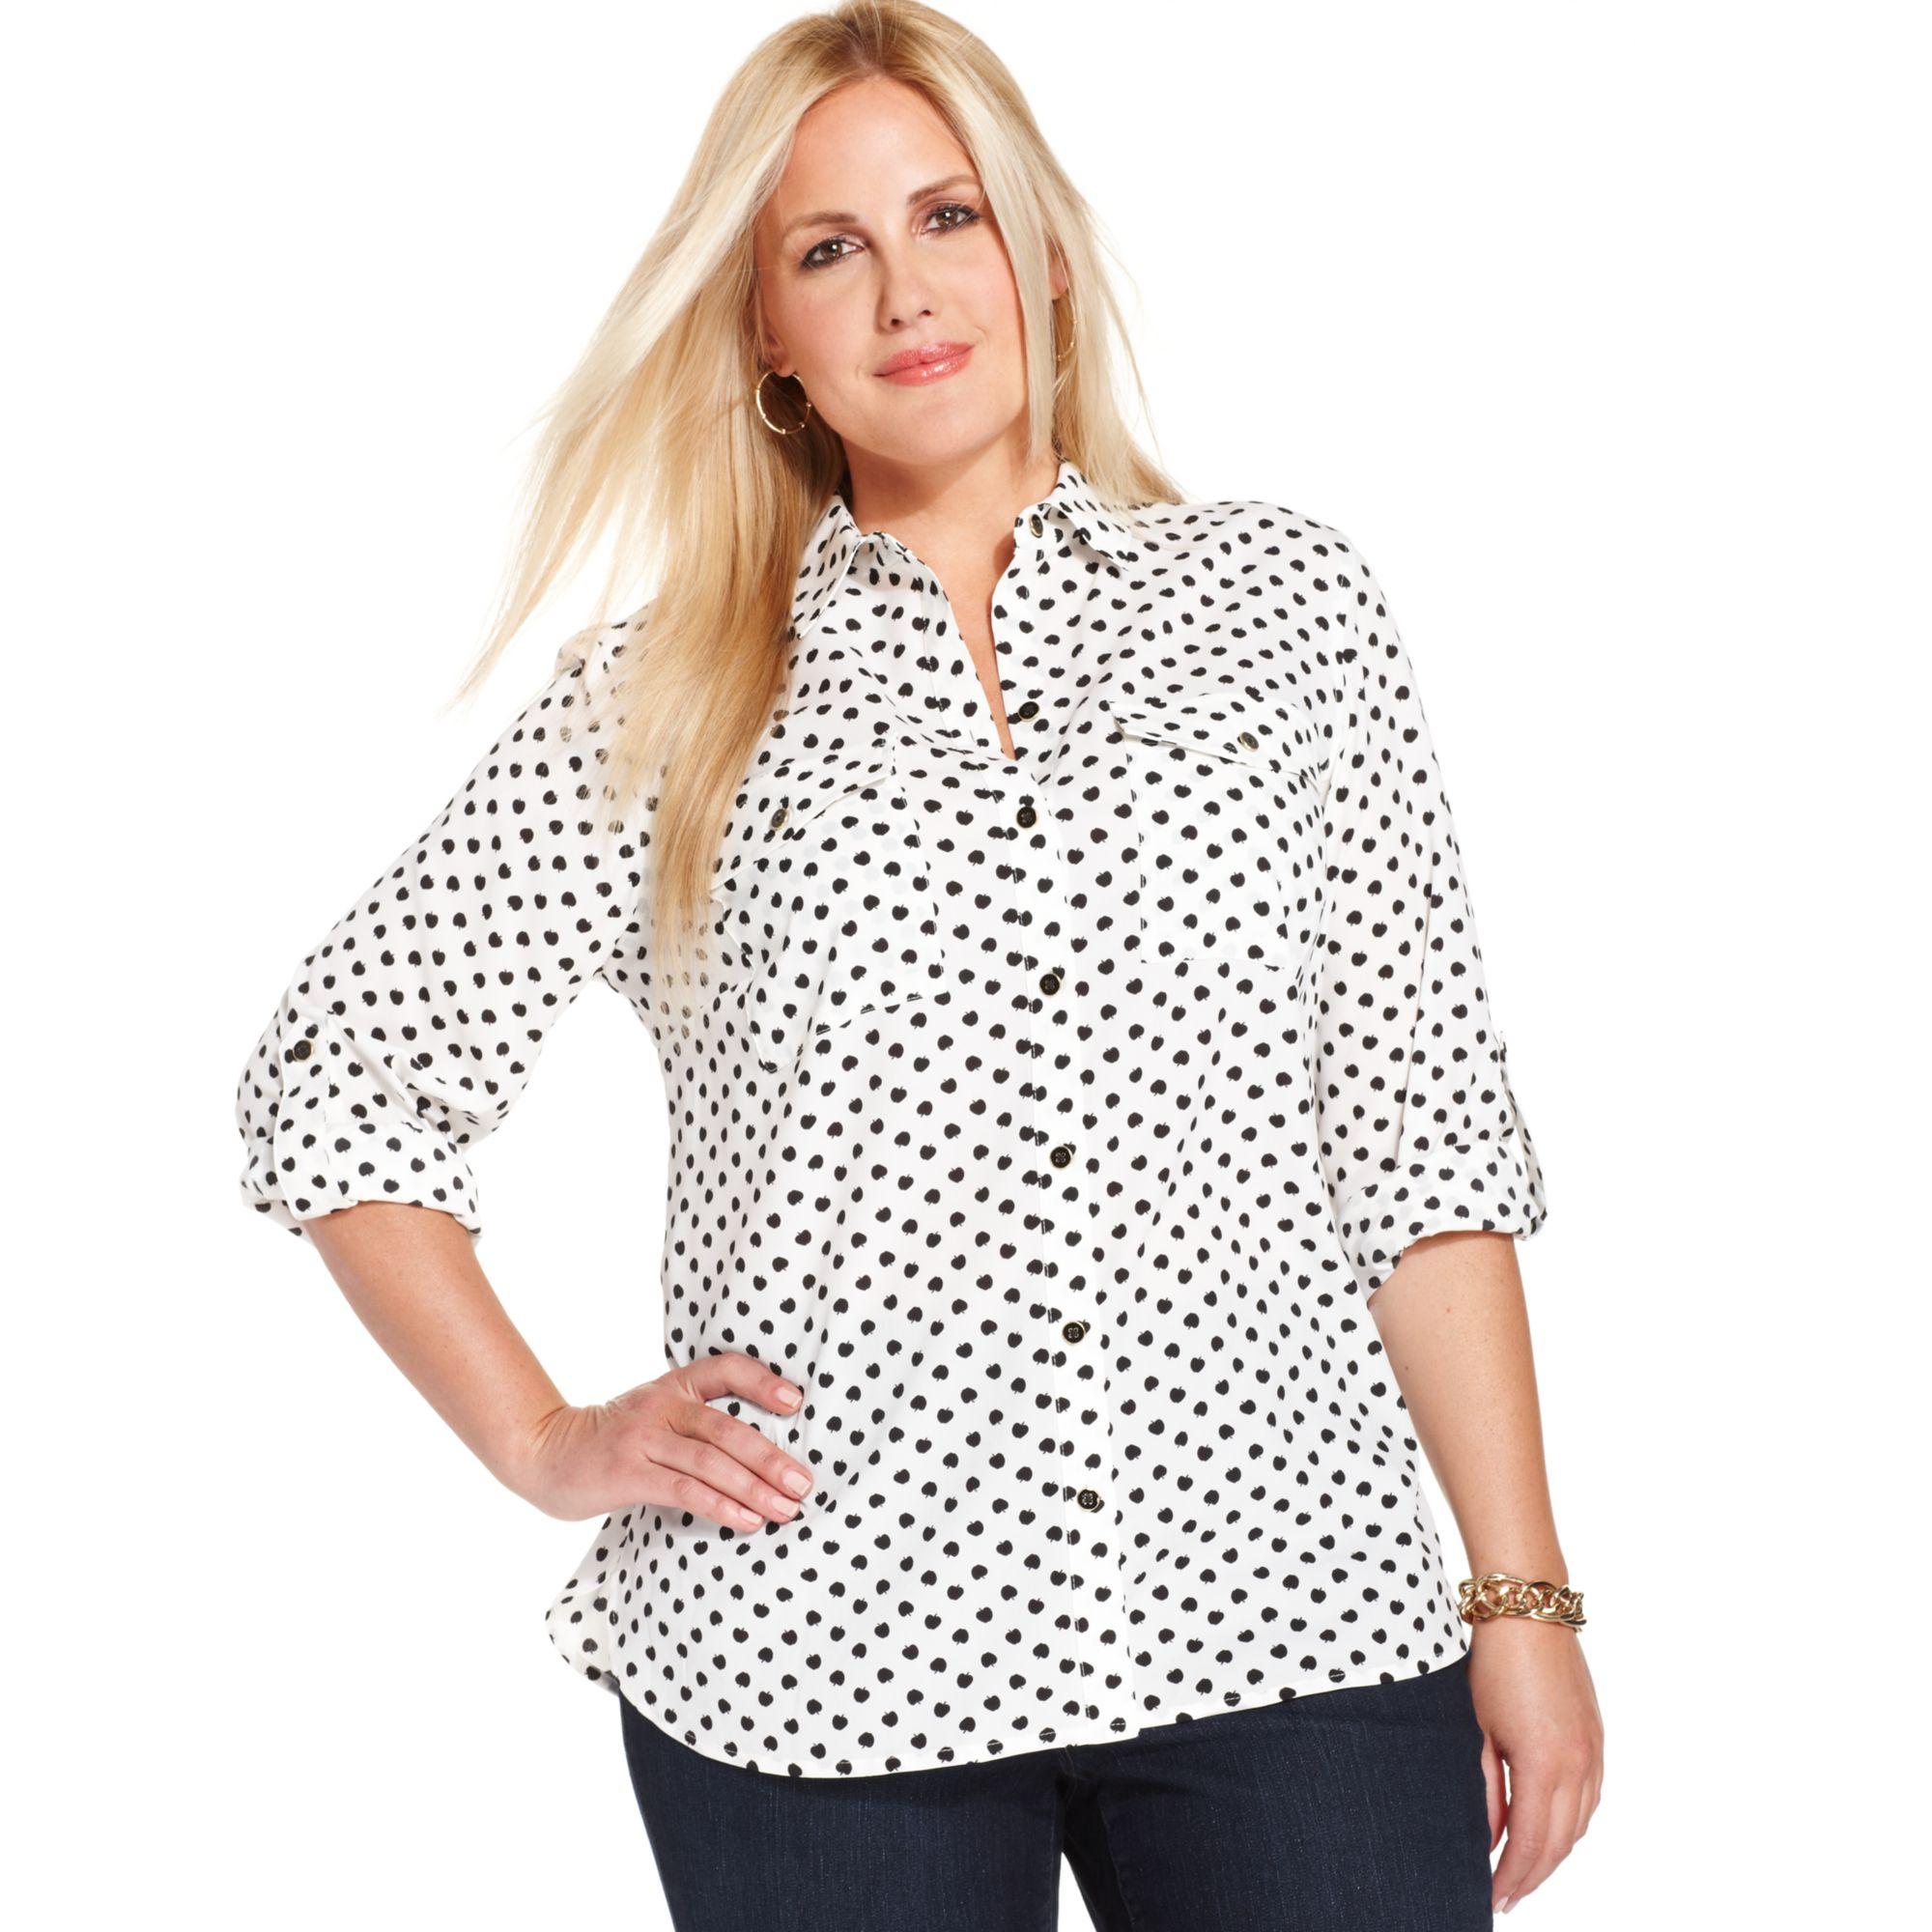 0f3ce615d2995 Lyst - Jones New York Signature Plus Size Appleprint Utility Shirt ...